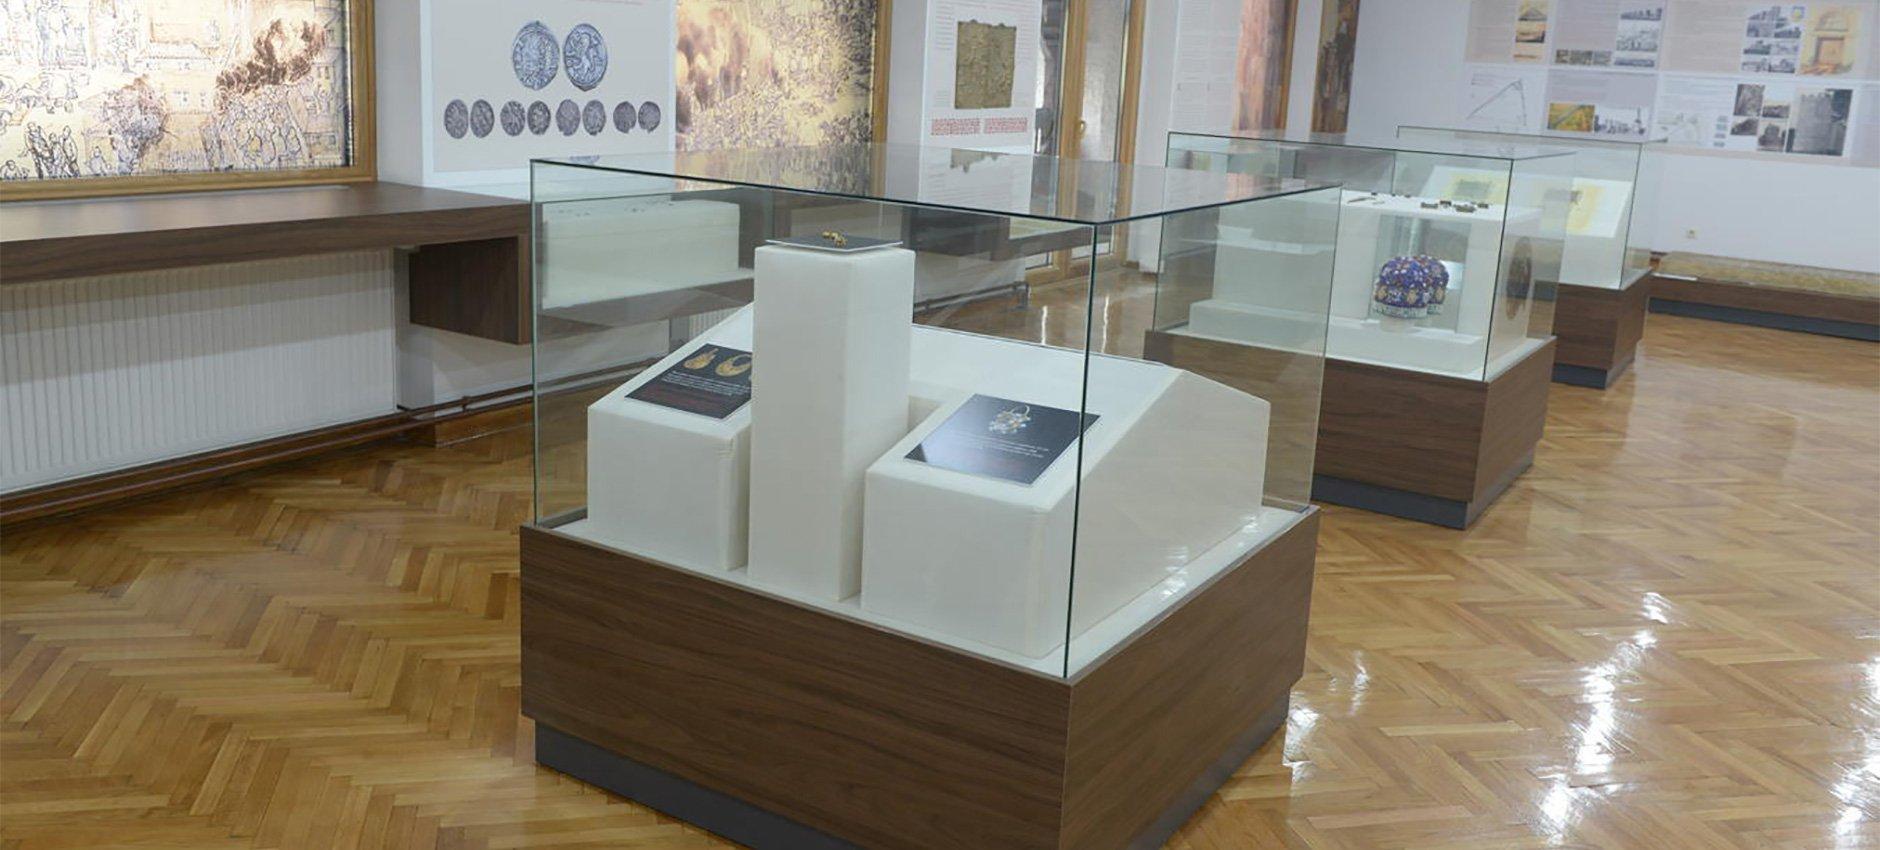 smederevo-muzej-16.jpg